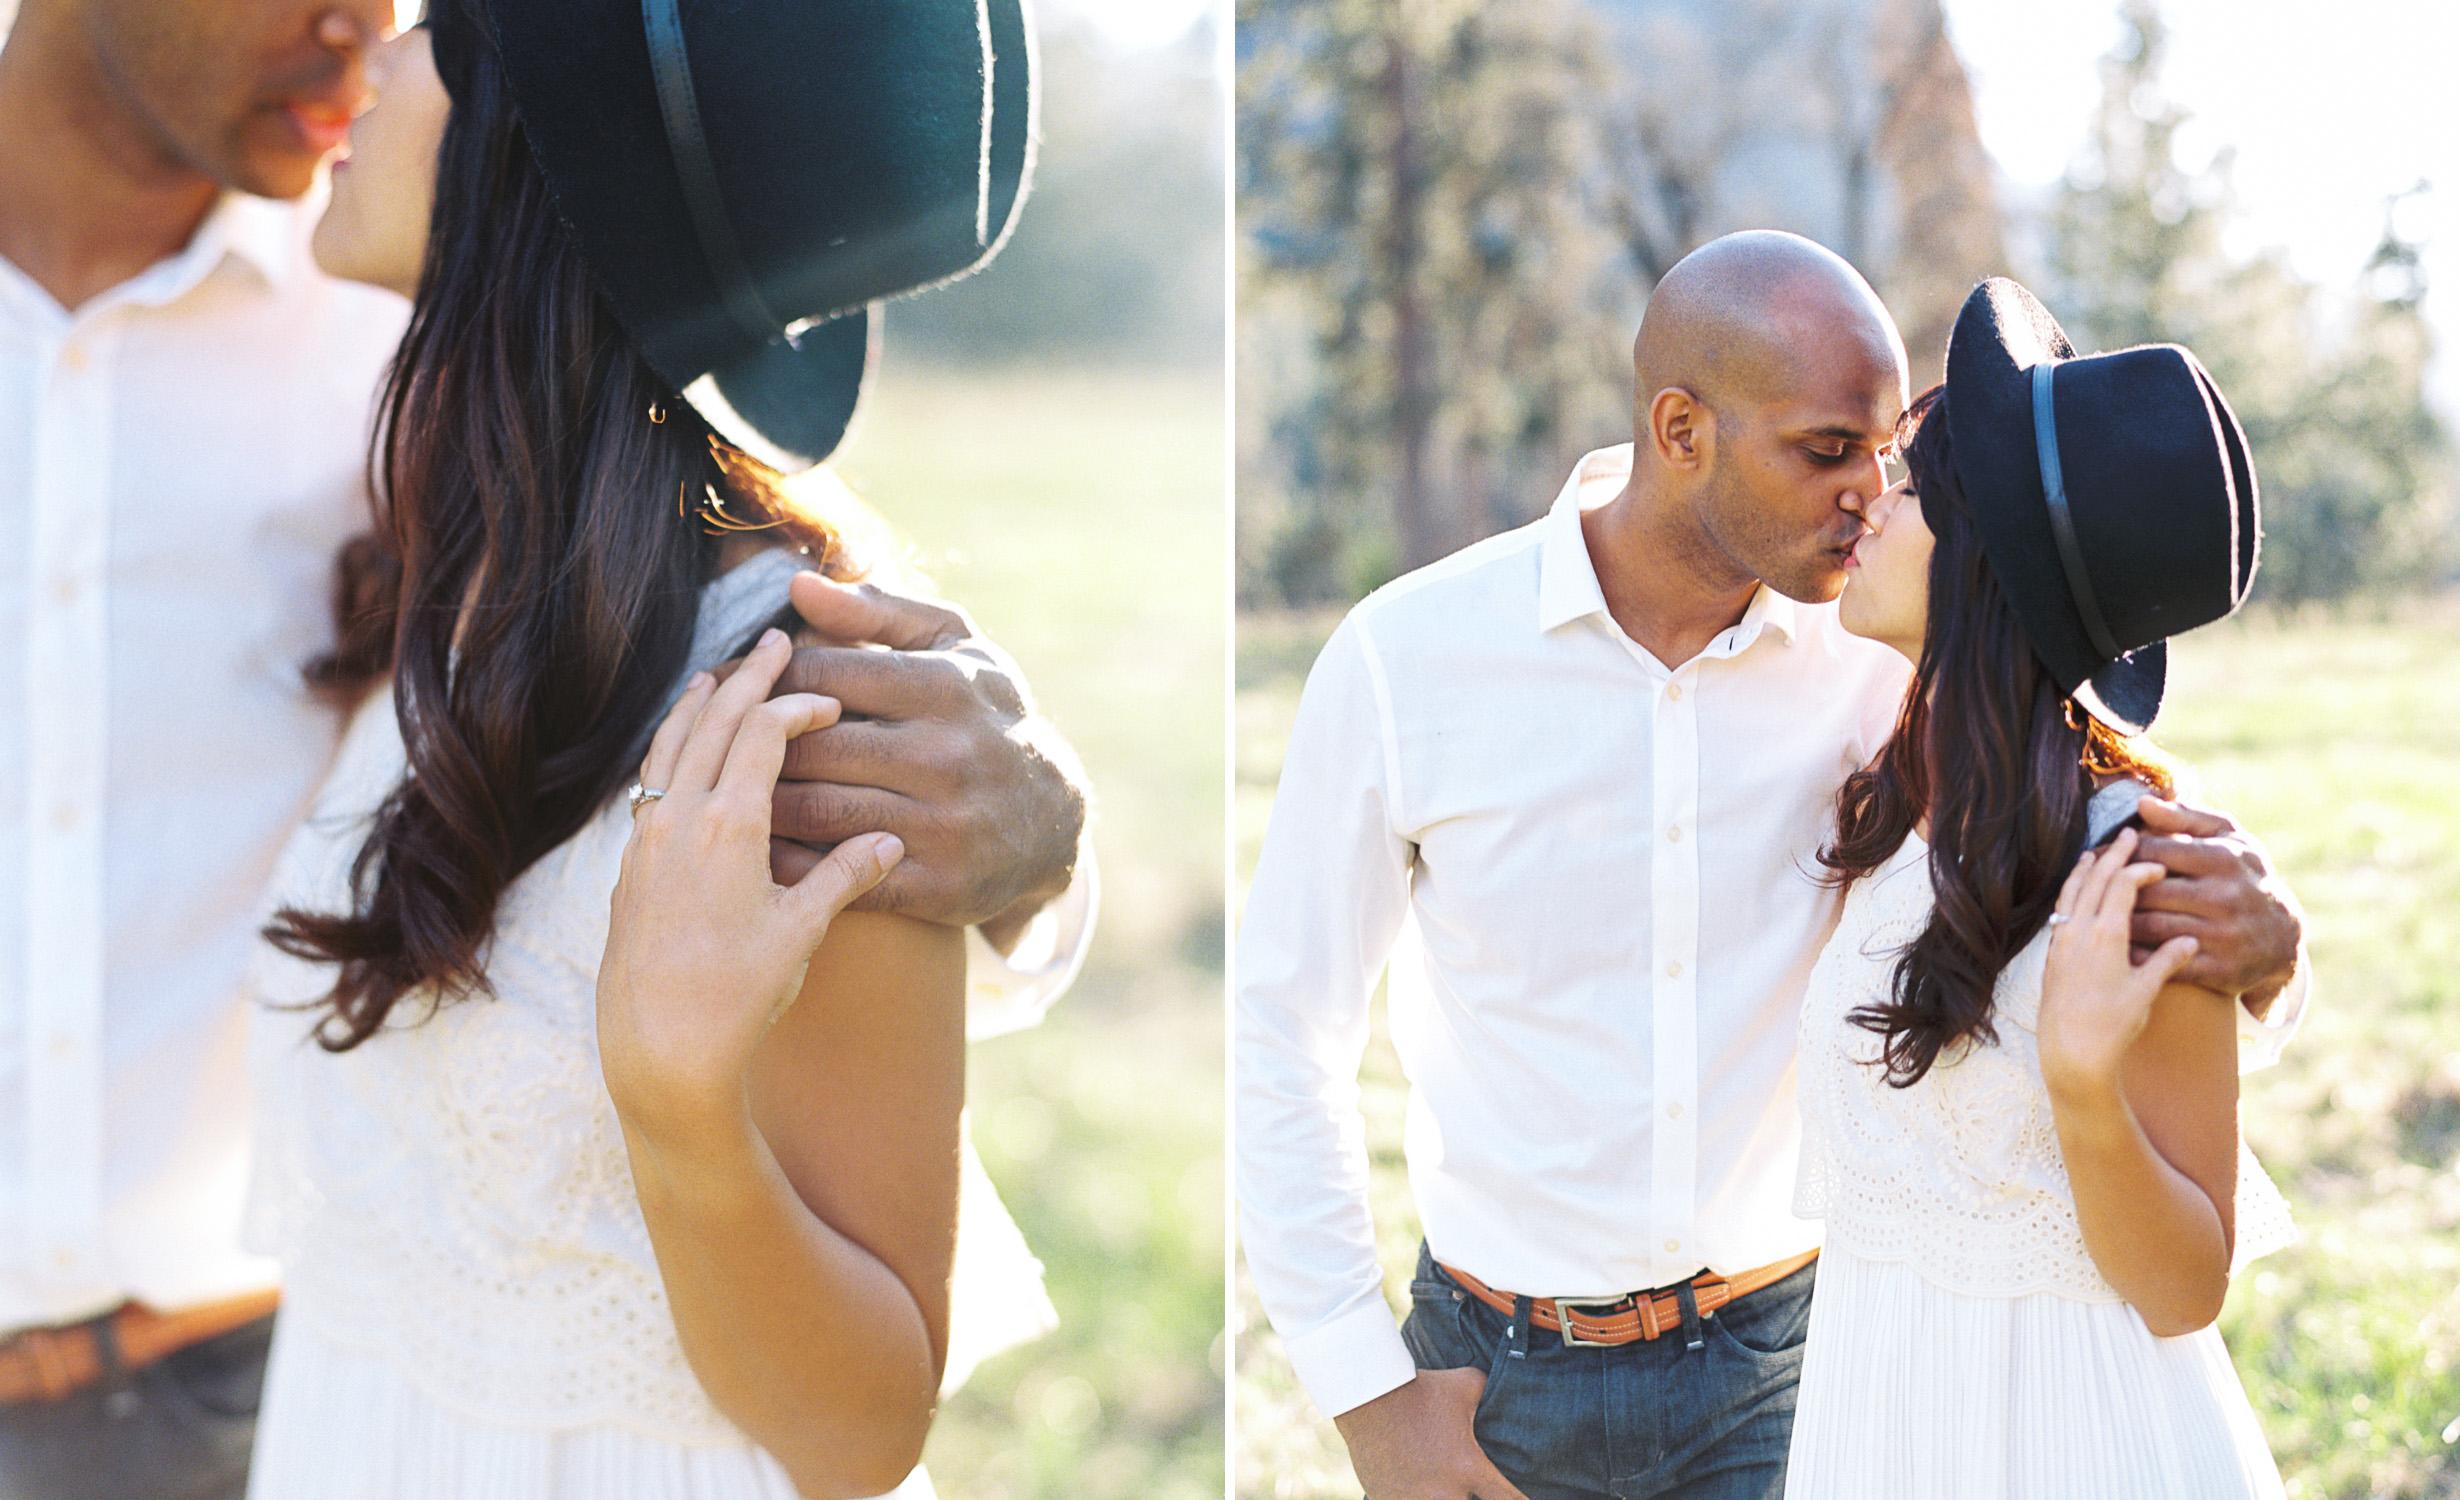 Yosemite-engagement-photography-film.jpg